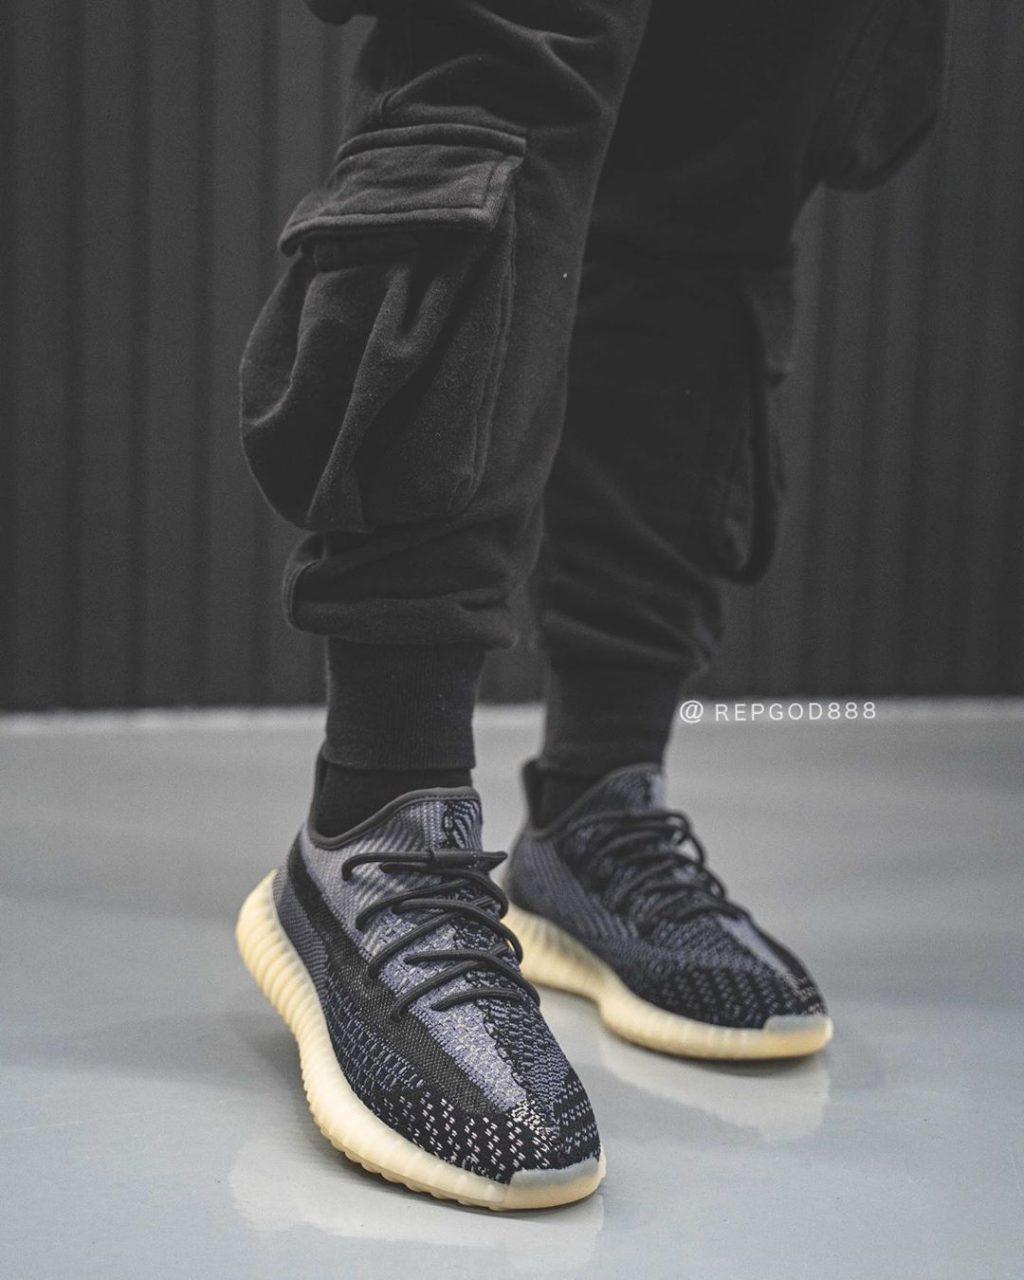 adidas-yeezy-boost-350-v2-asriel-release-202009